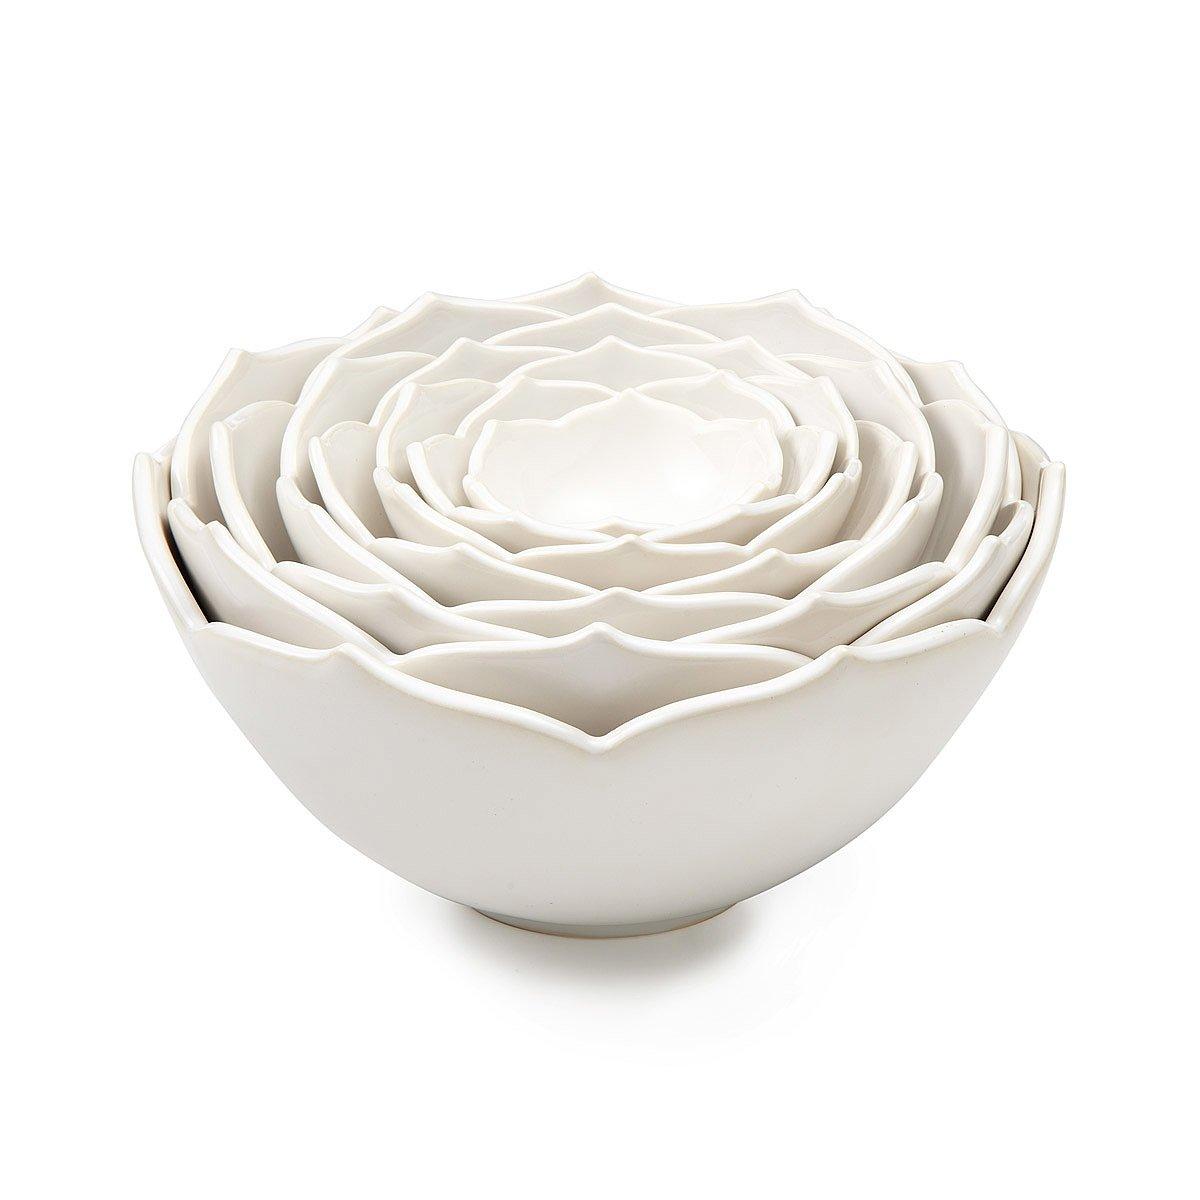 Nesting lotus bowls whitney smith ceramic flower uncommongoods nesting lotus bowls 1 thumbnail izmirmasajfo